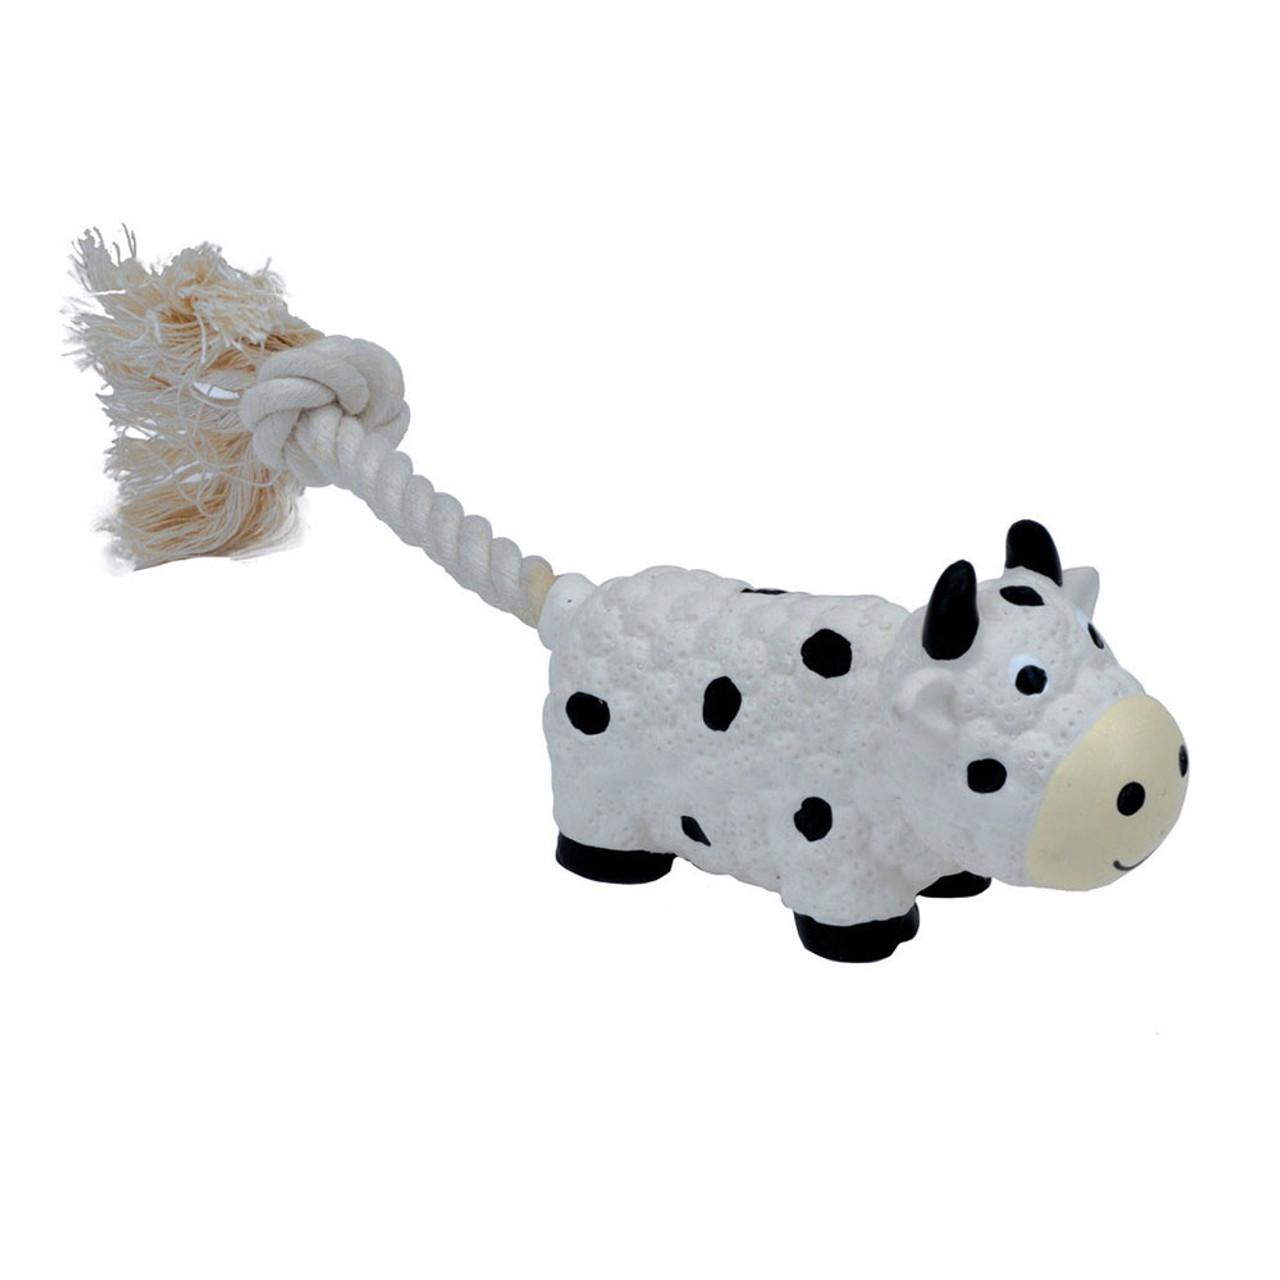 Li'l Pals Latex Cow Dog Toy